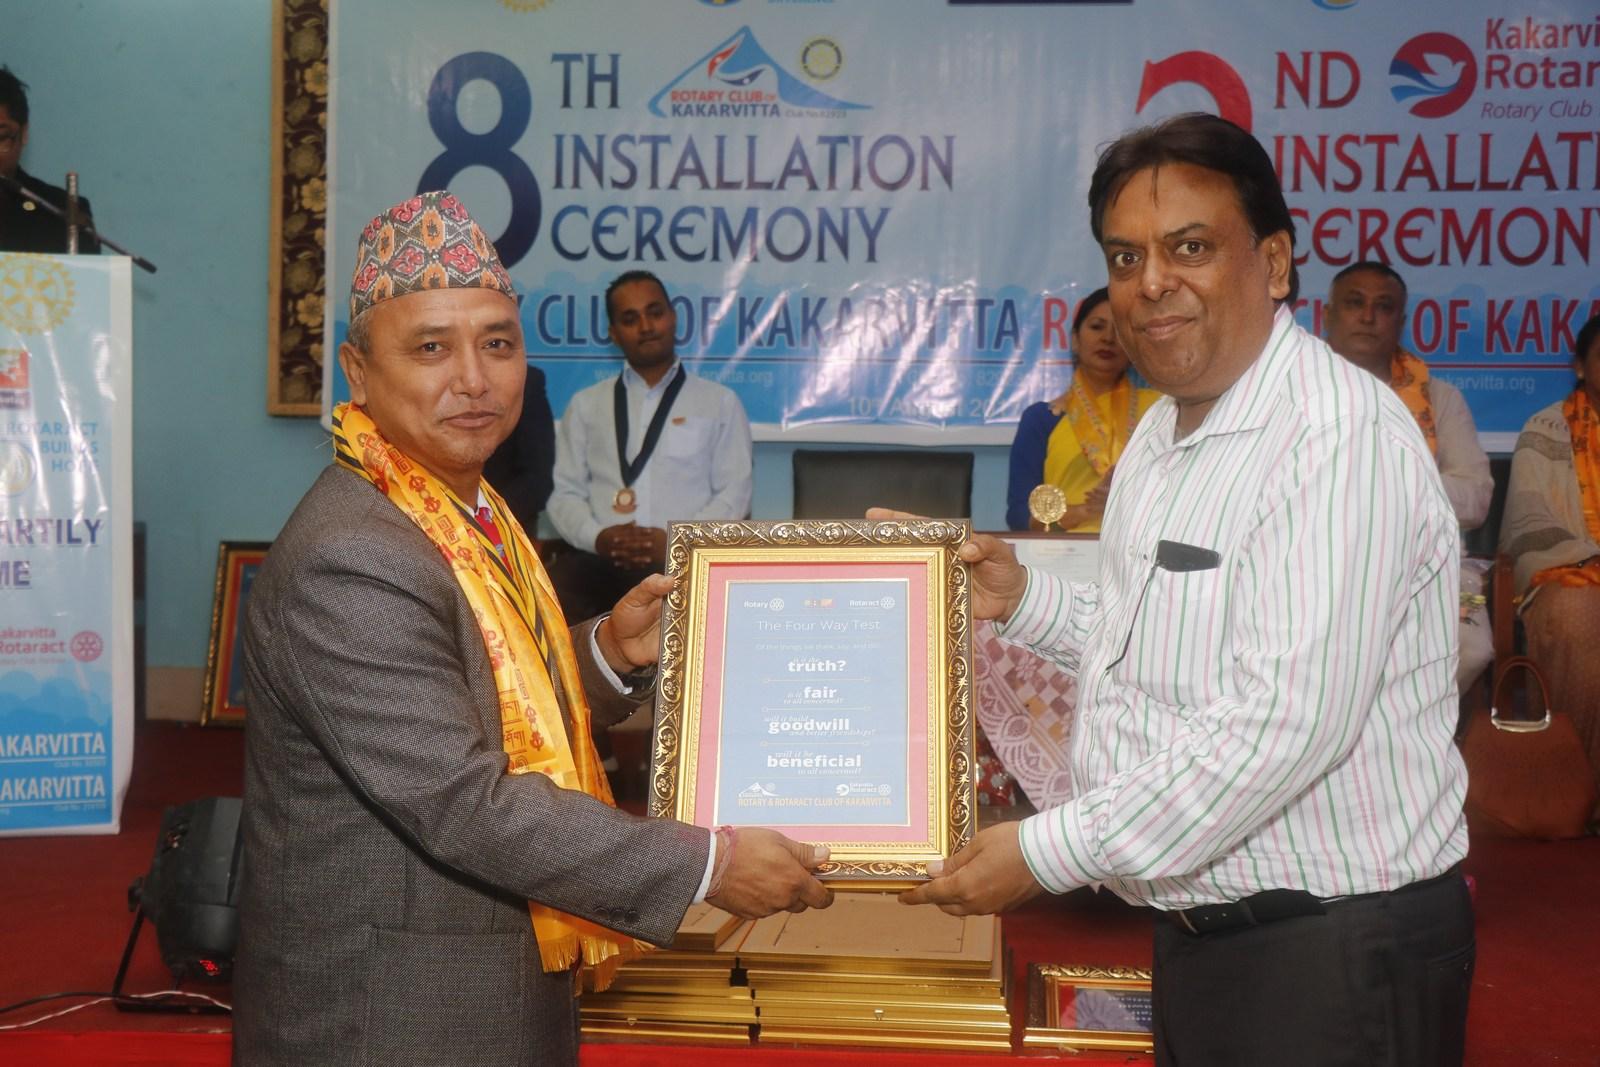 8th-Installation-Ceremony-Rotary-Club-of-Kakarvitta-107